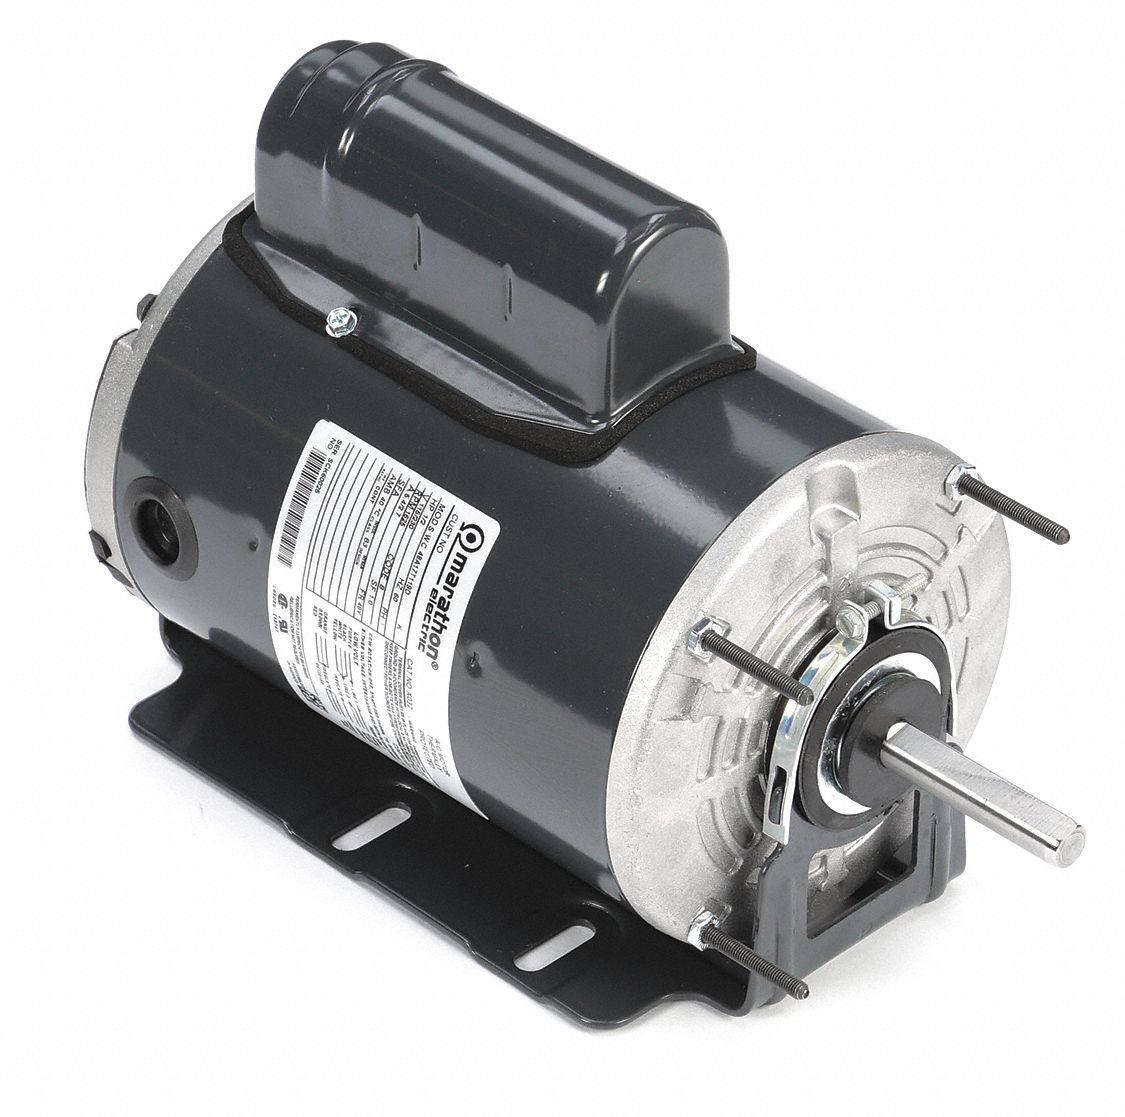 Marathon Motors Motor Psc 1 2 Hp 1625 Rpm 115 230 V